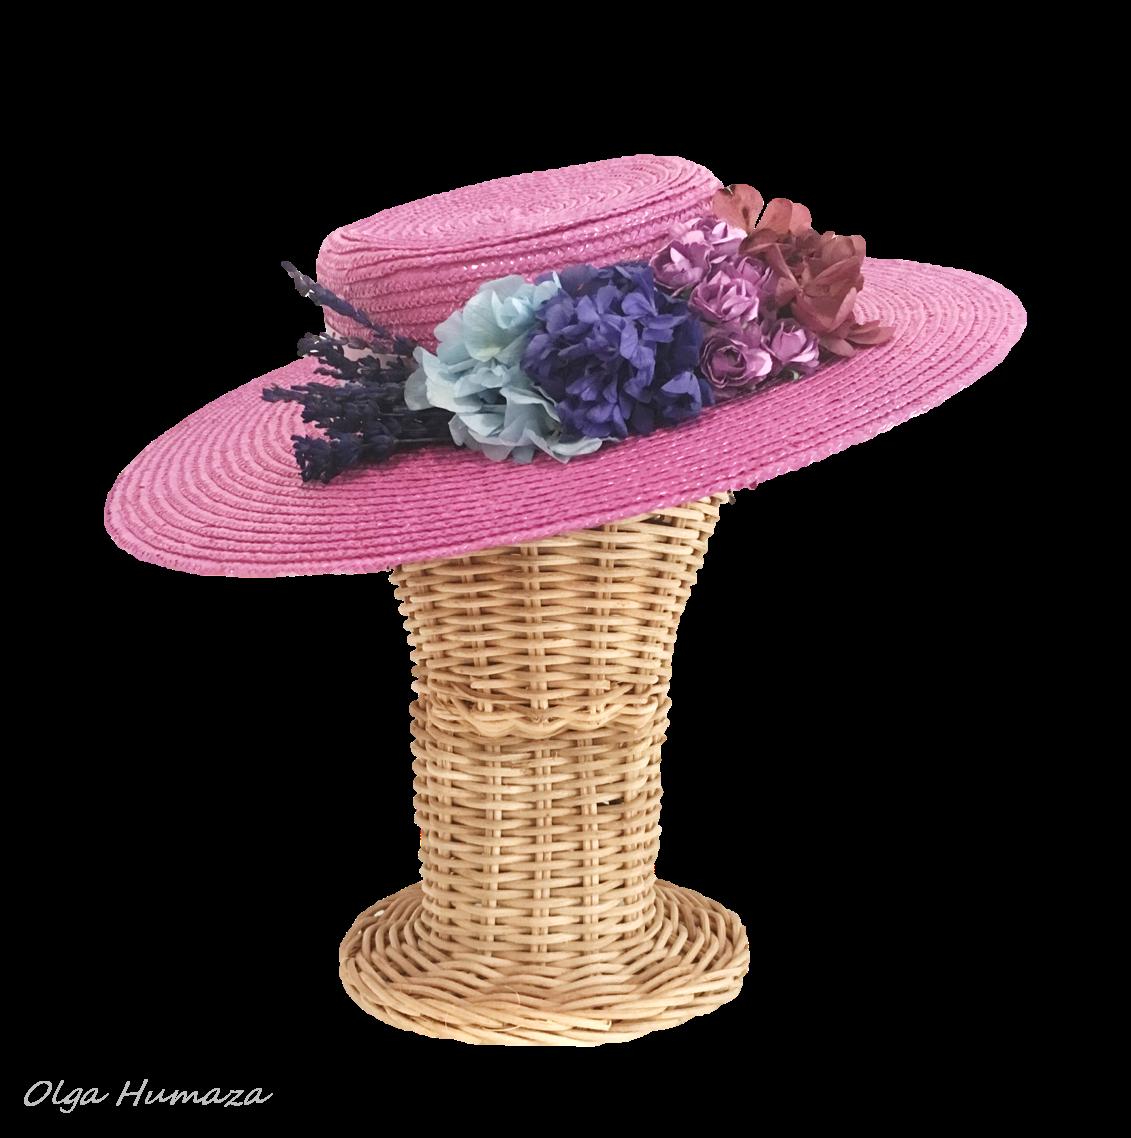 http://olgahumaza.blogspot.com.es/2014/02/b04-sombrero-canotier-encaje-negro-y.html